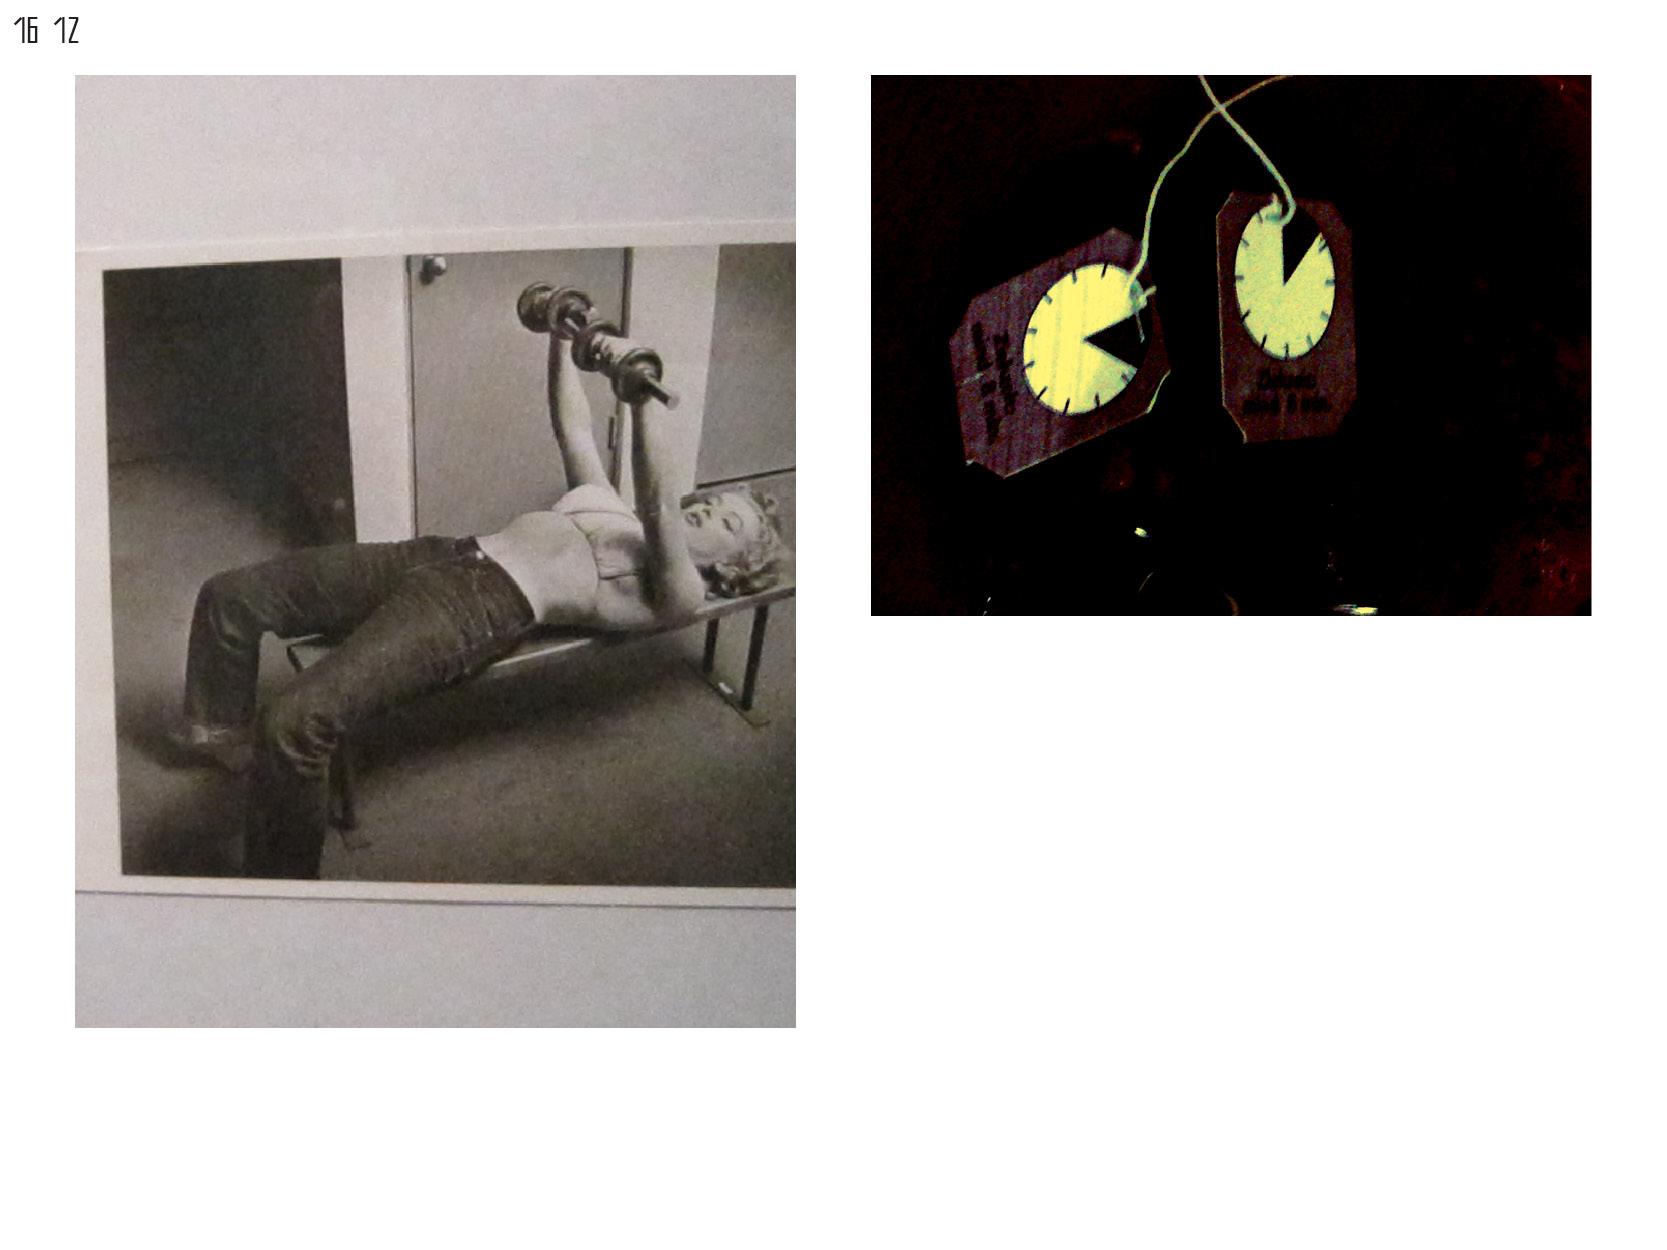 Gerrit-Schweiger-Dialog-Städte-Paris-Berlin-Jessica-Blank-Experiment-Fotoserie-Tagebuch-visuelle-Kommunikation-57